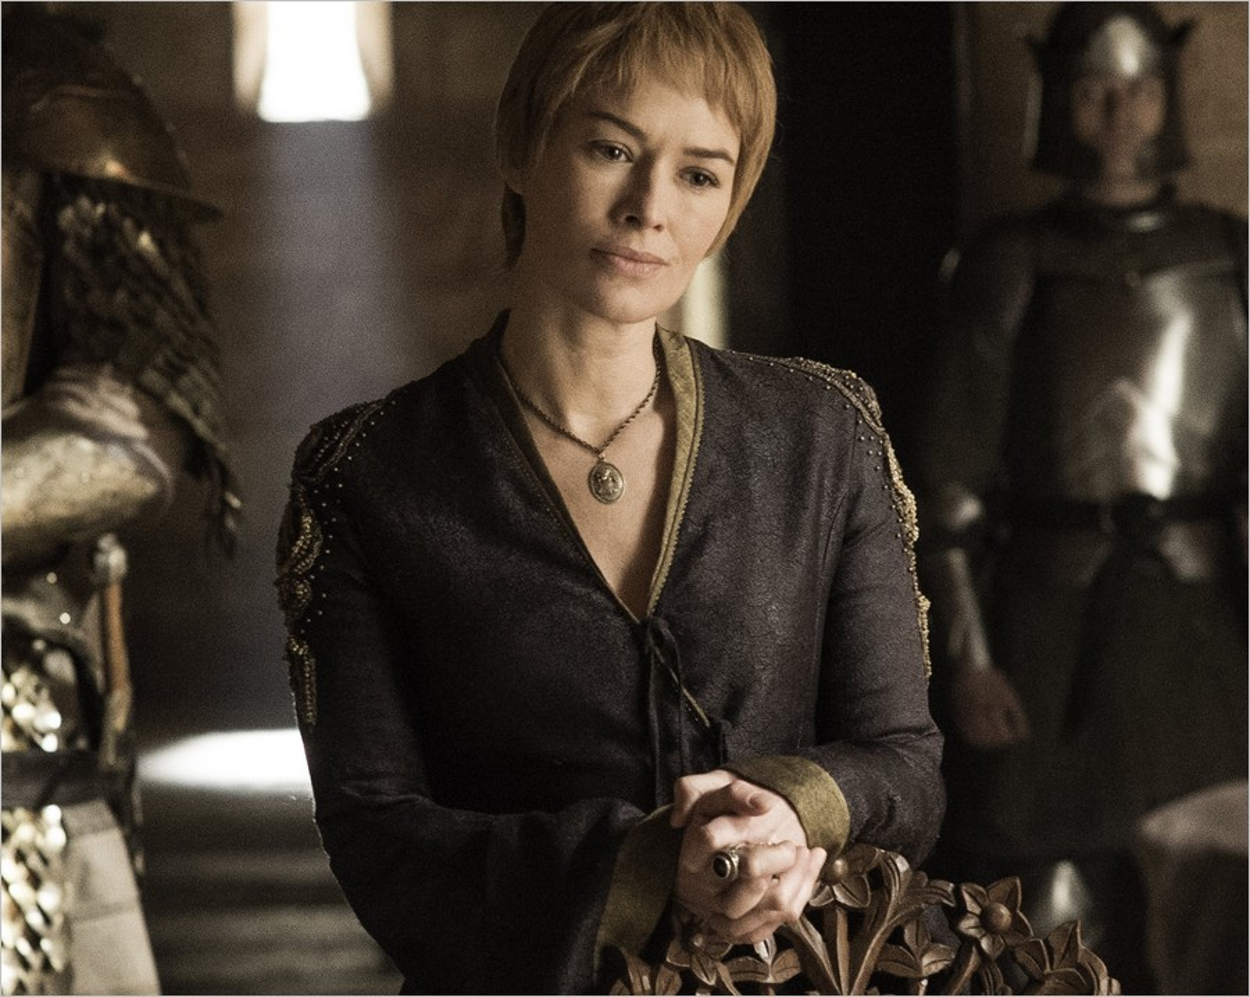 Cersei Lannister - Game Of Thrones saison 6 épisode 7